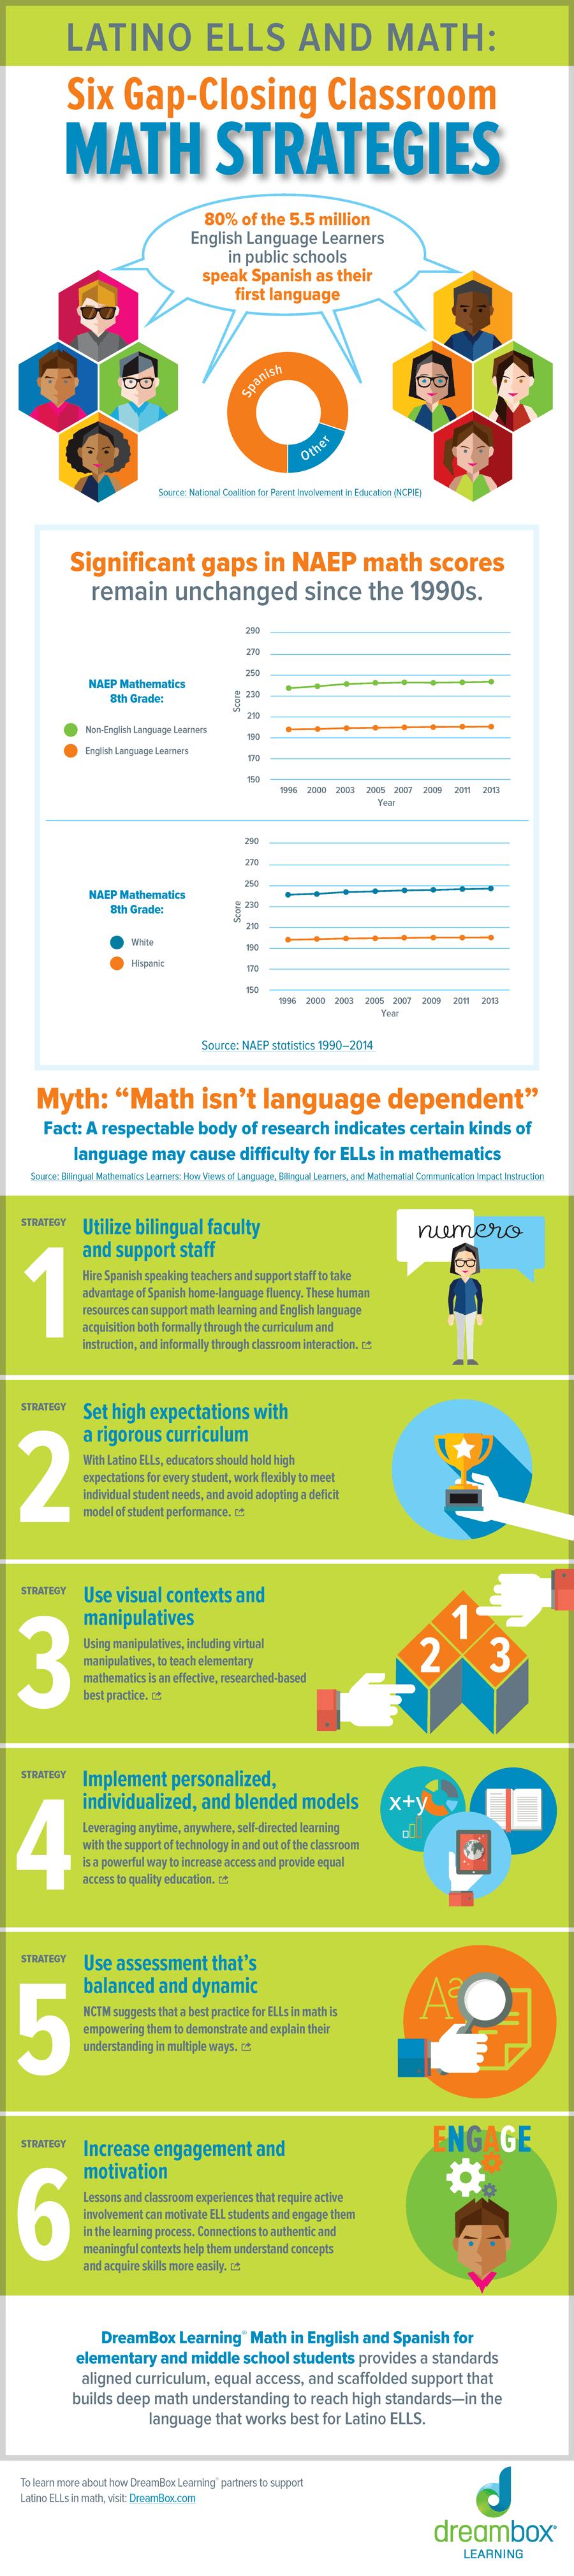 Six Gap-Closing Classroom Math Strategies Infographic